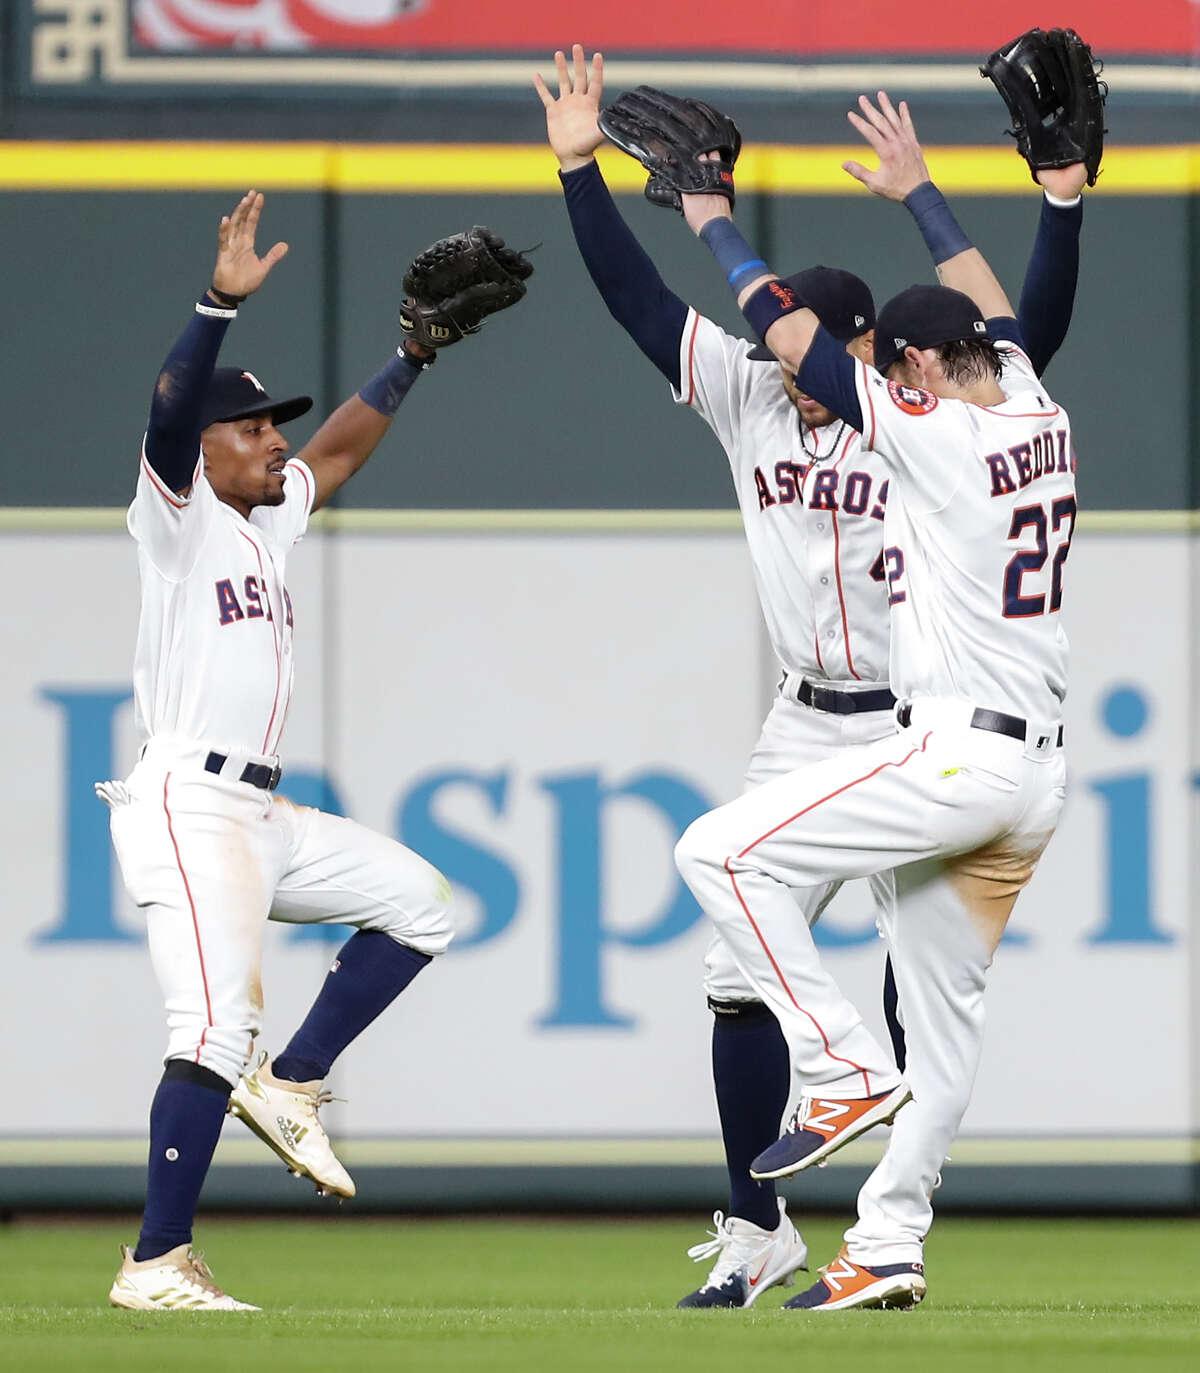 Houston Astros left fielder Tony Kemp (18), Houston Astros center fielder George Springer (4) and Houston Astros right fielder Josh Reddick (22) celebrate the Astros 5-1 win over the Tampa Bay Rays at Minute Maid Park on Wednesday, June 20, 2018, in Houston. ( Brett Coomer / Houston Chronicle )